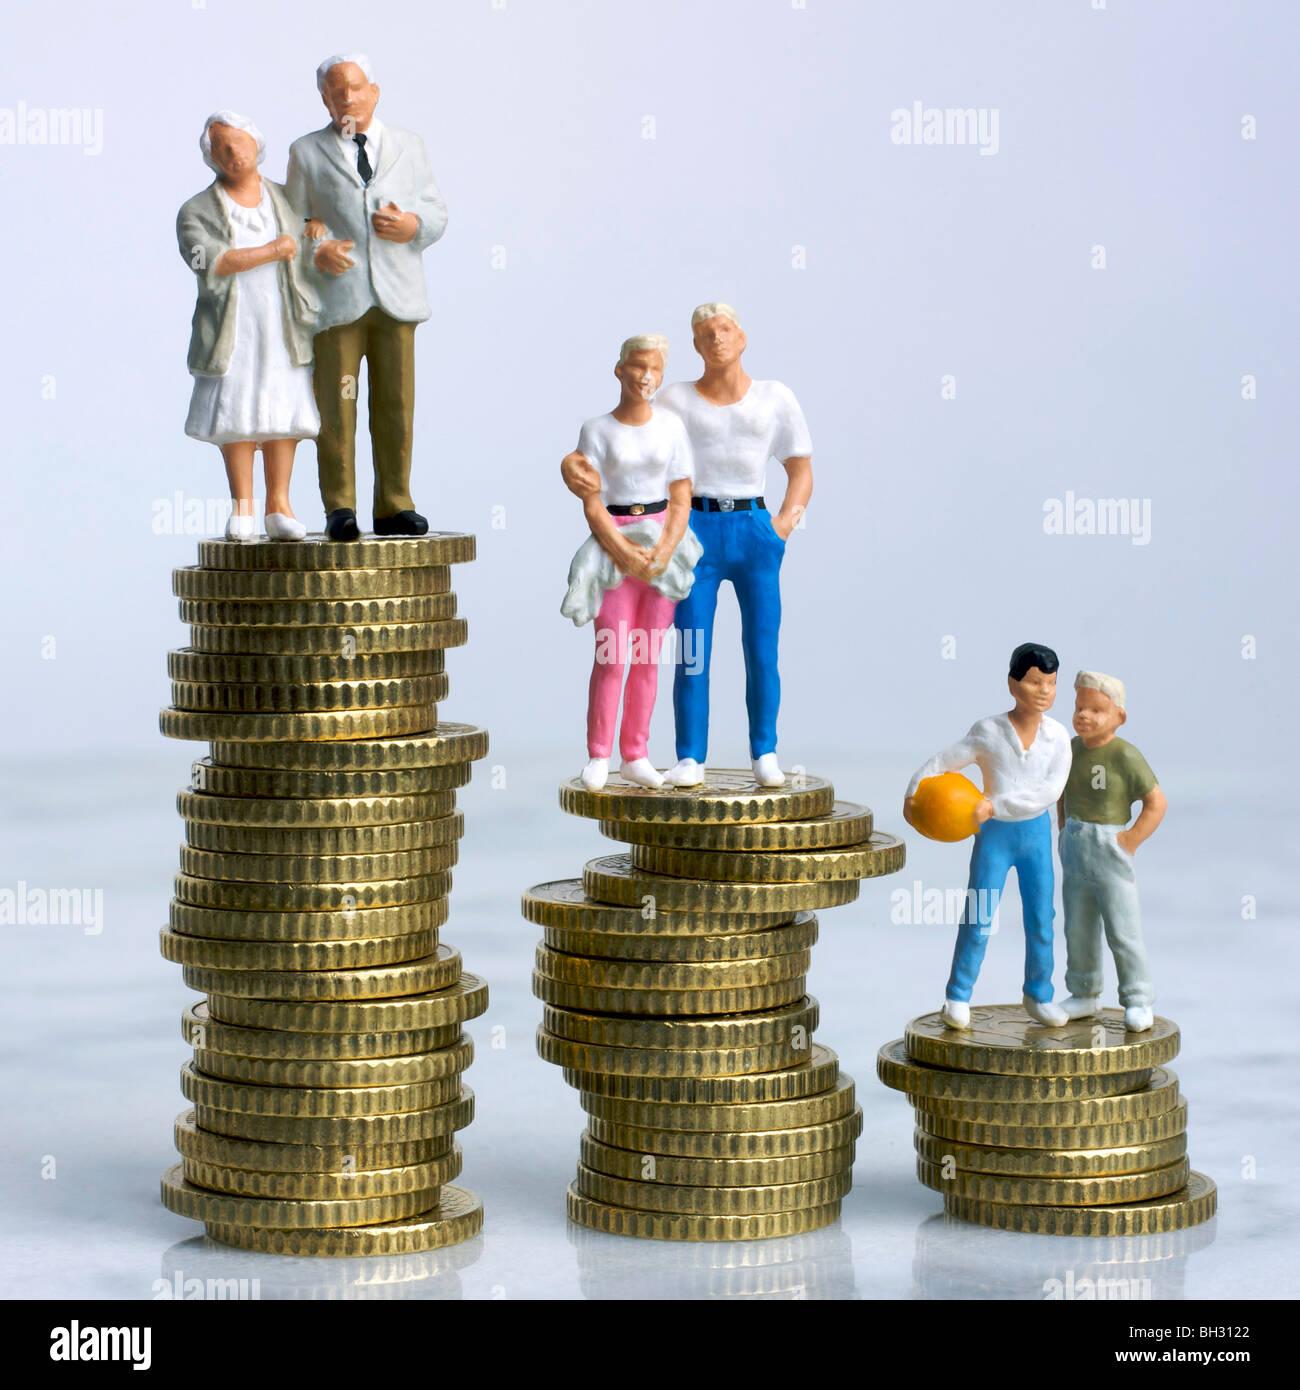 Family (Figurines) on money - finances / inheritance / budgeting / savings concept - Stock Image